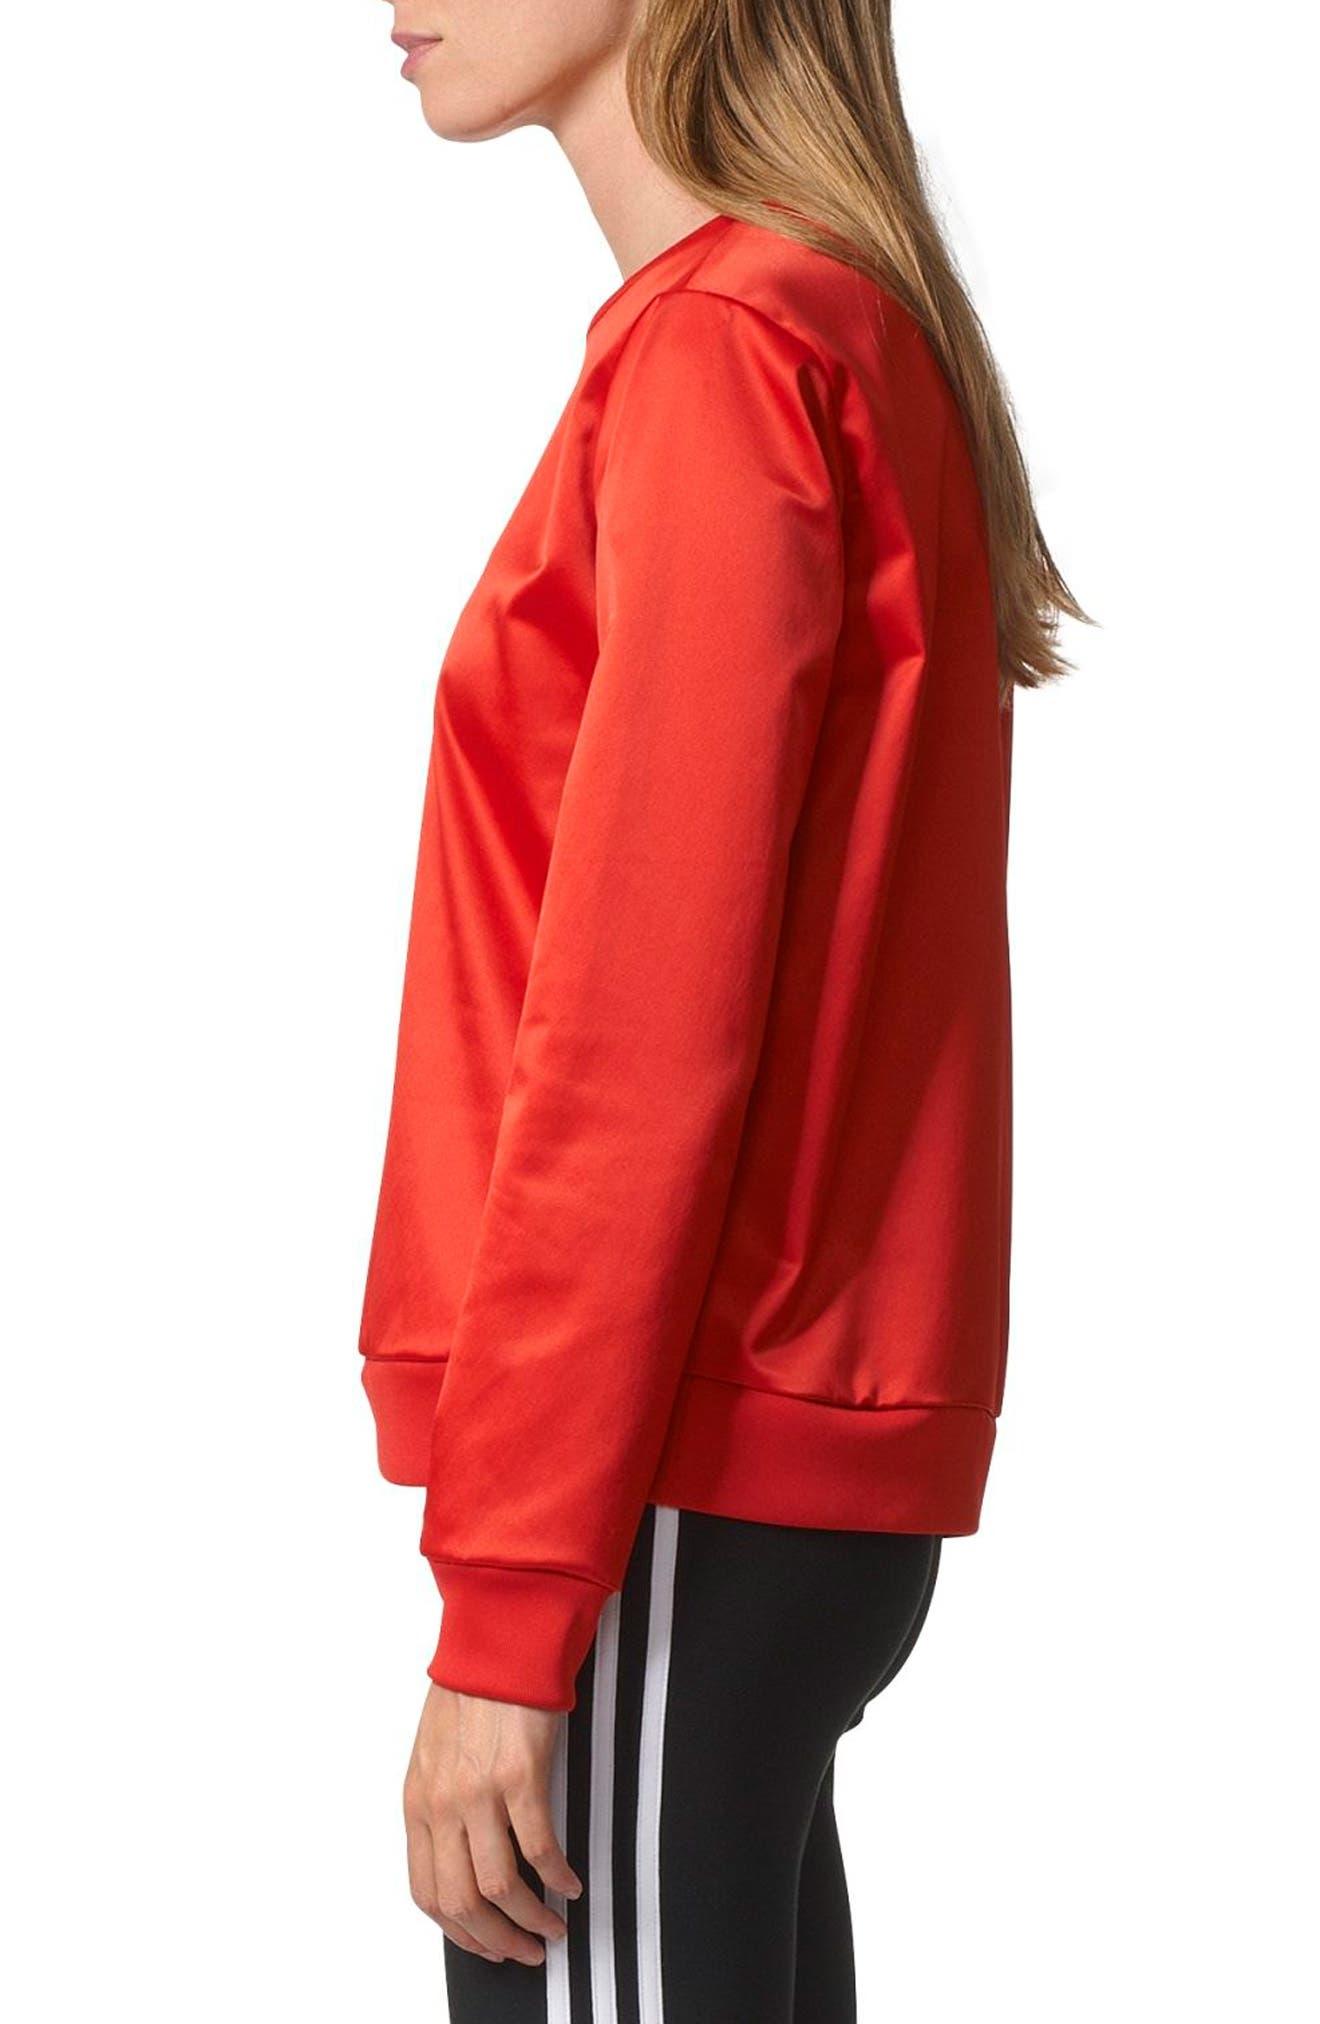 Trefoil Crewneck Sweater,                             Alternate thumbnail 3, color,                             Vivid Red S13